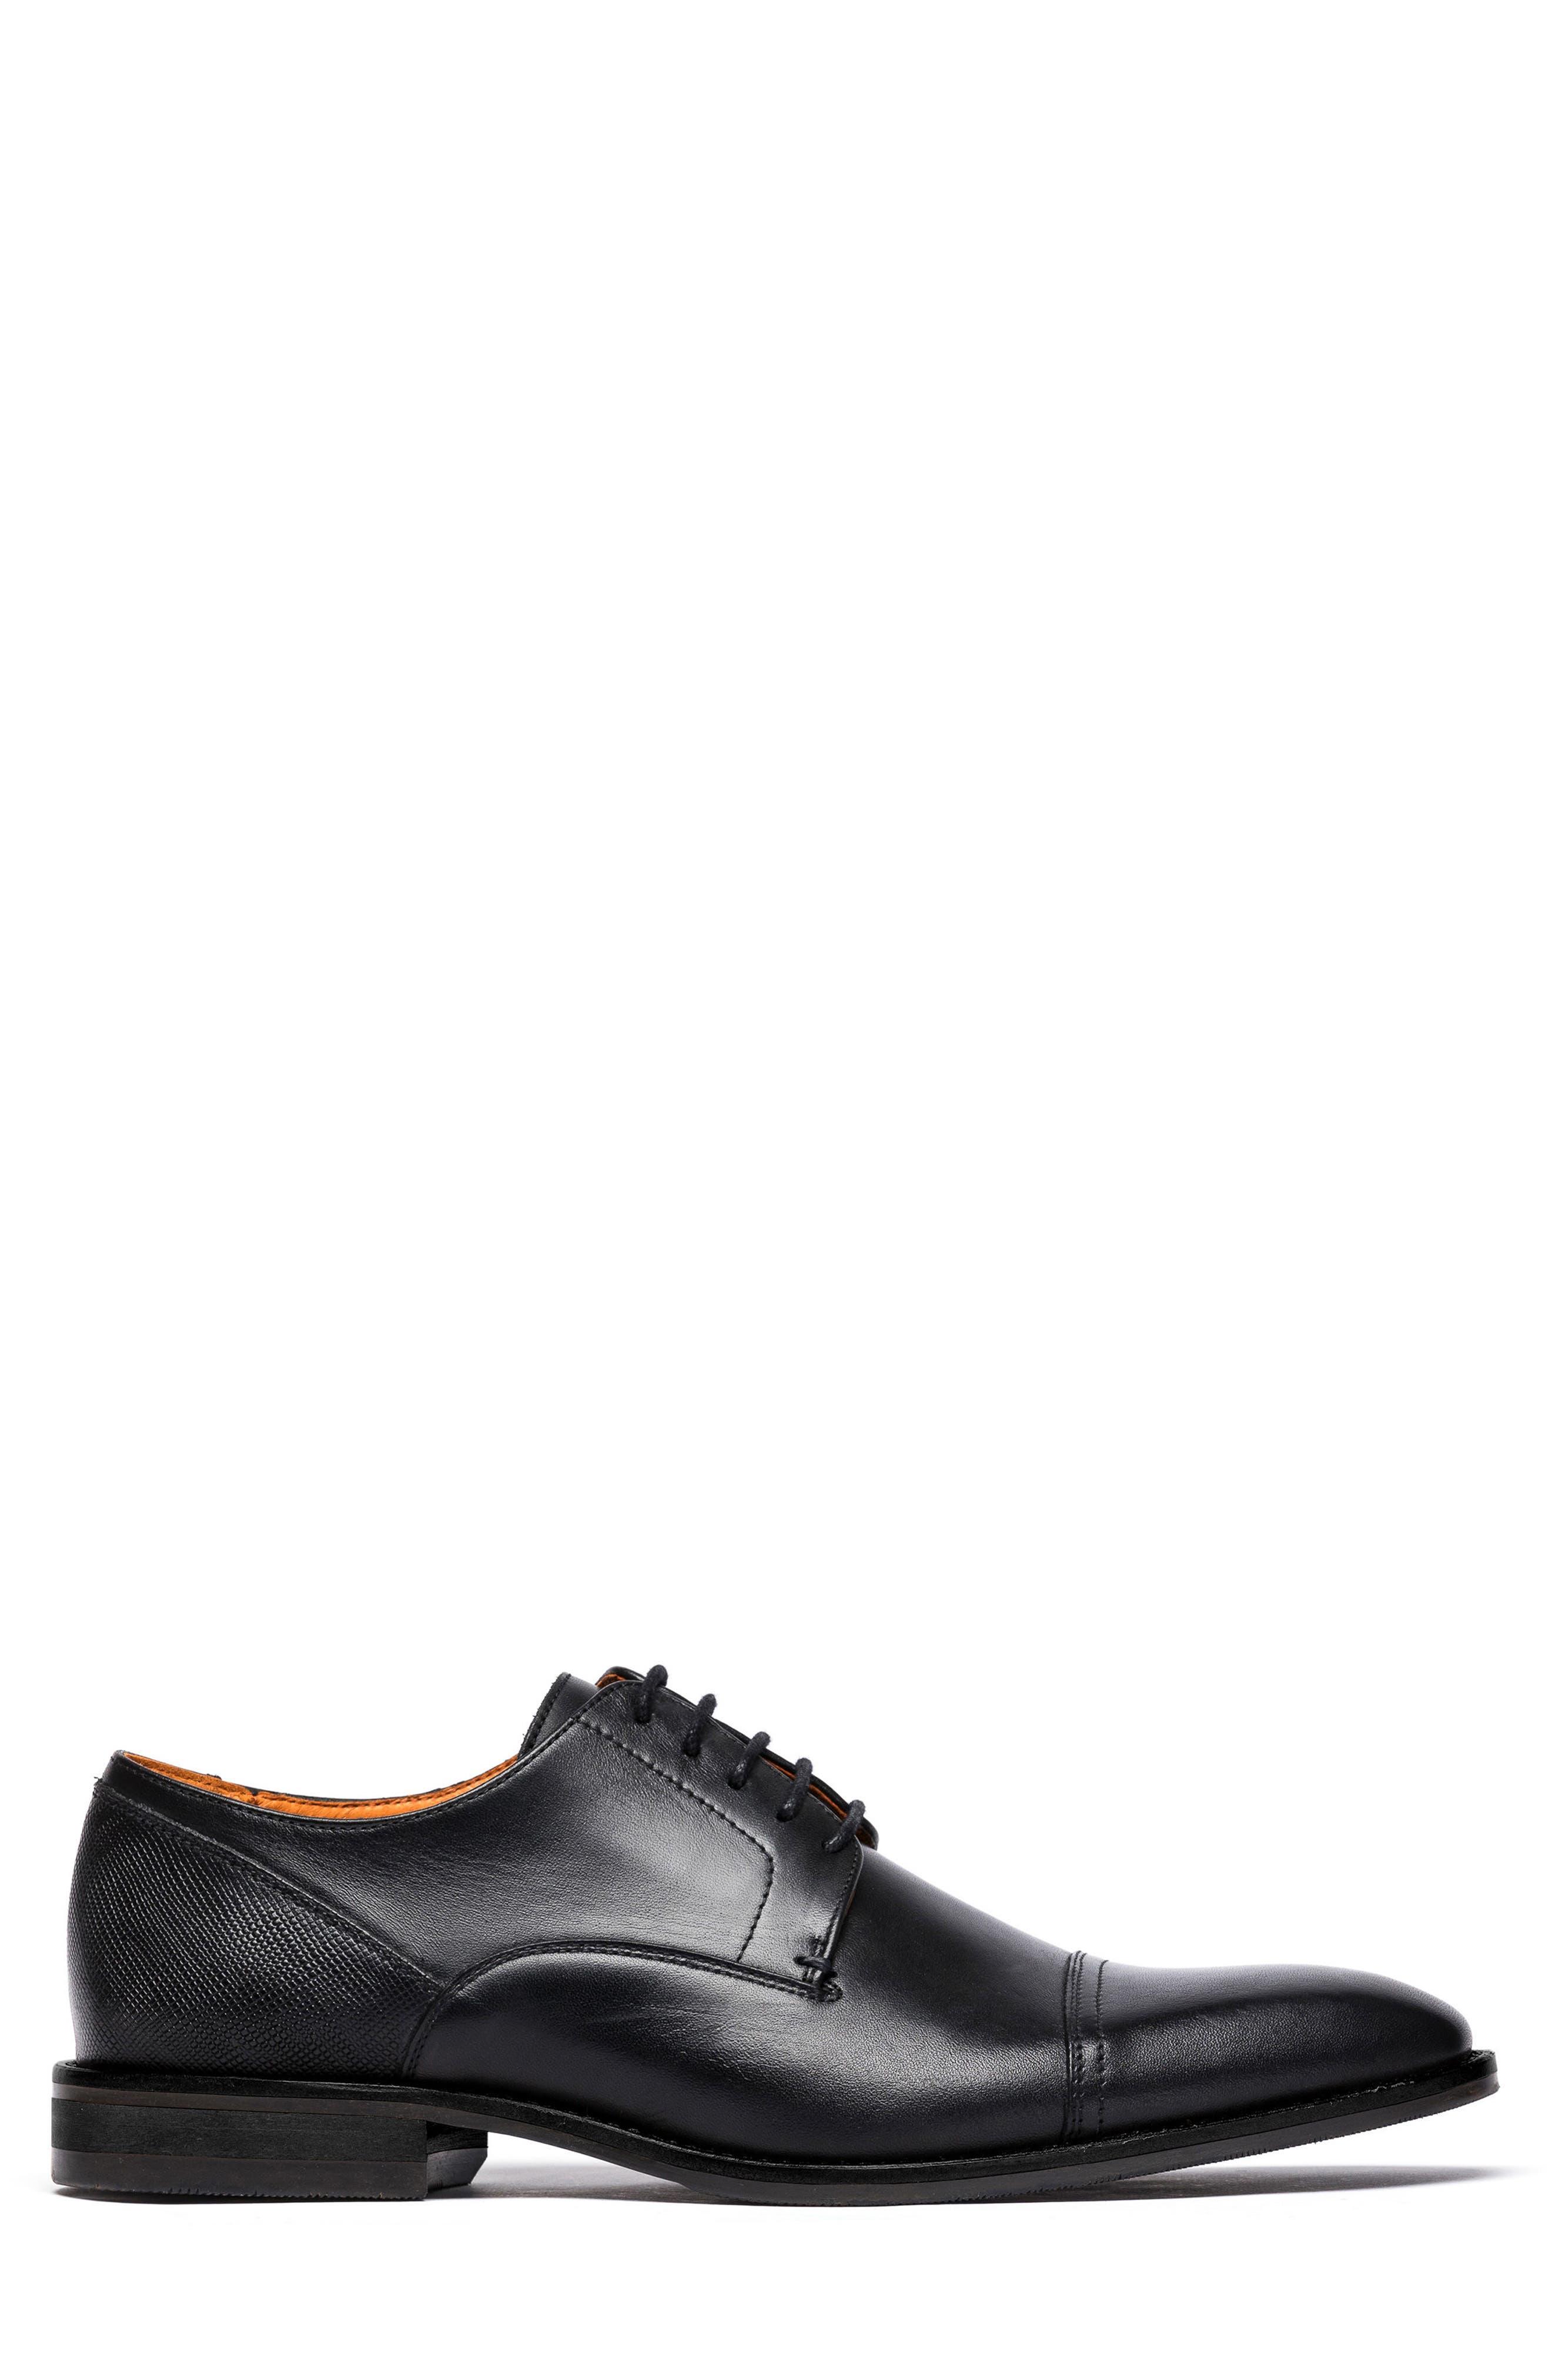 Franklin Cap Toe Derby,                             Alternate thumbnail 3, color,                             Nero Leather